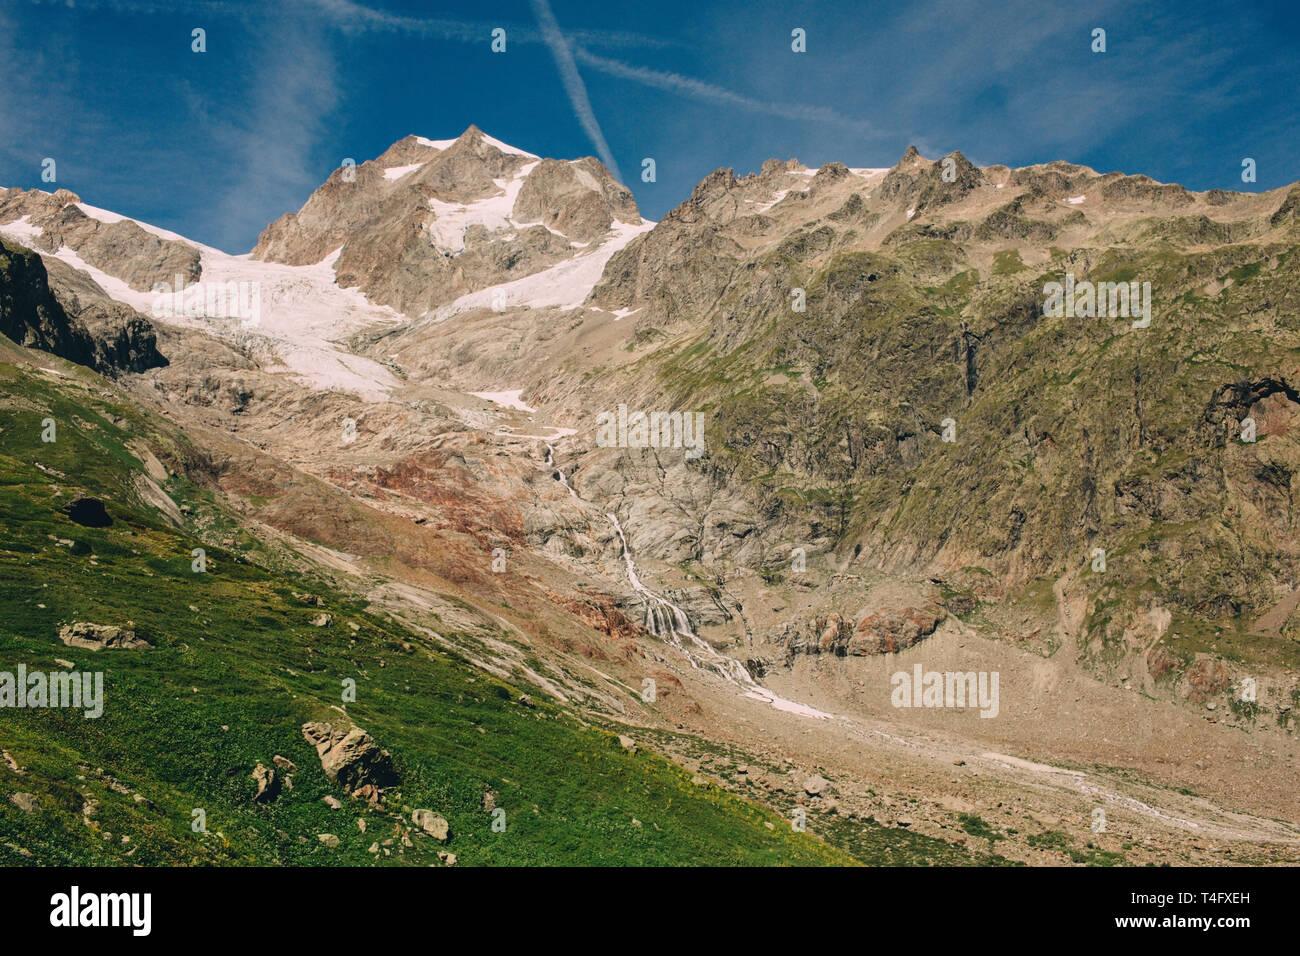 glacier on the popular hiking track around the Mont Blanc near alpine hut Elizabeth. - Stock Image